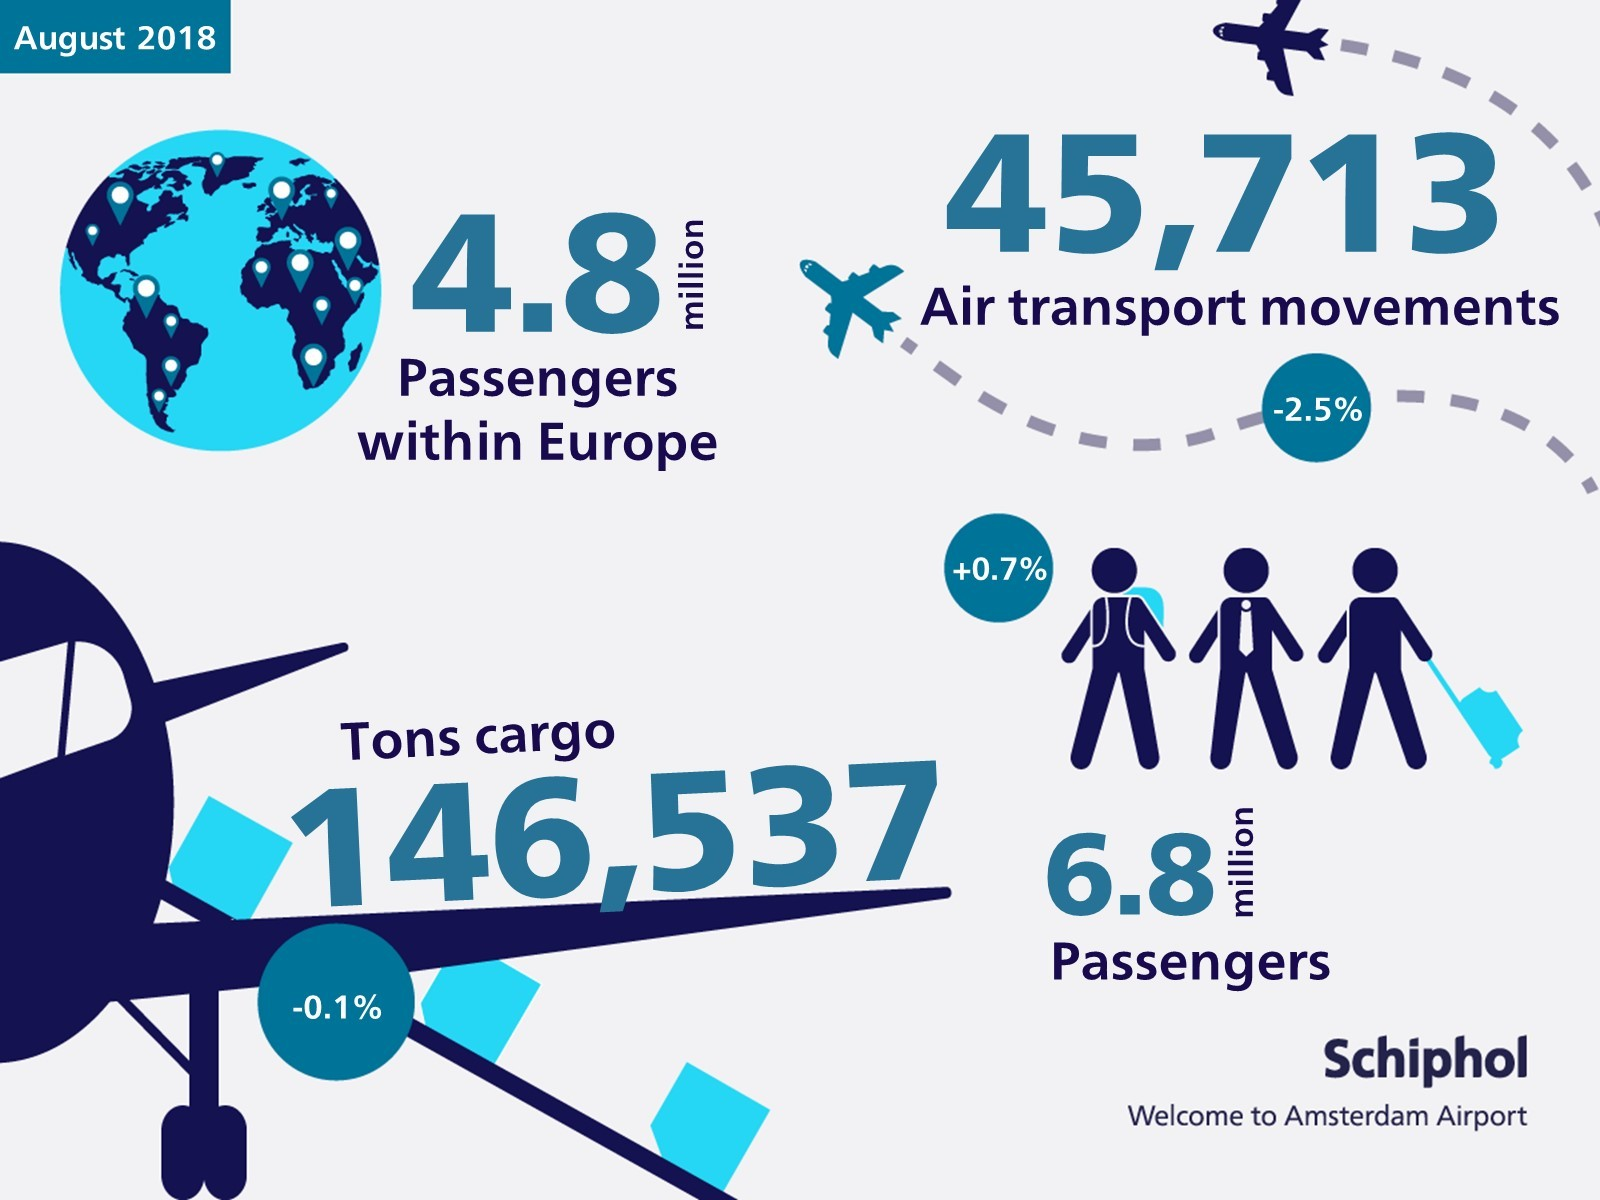 Verkeer- en vervoerscijfers augustus 2018 ENG